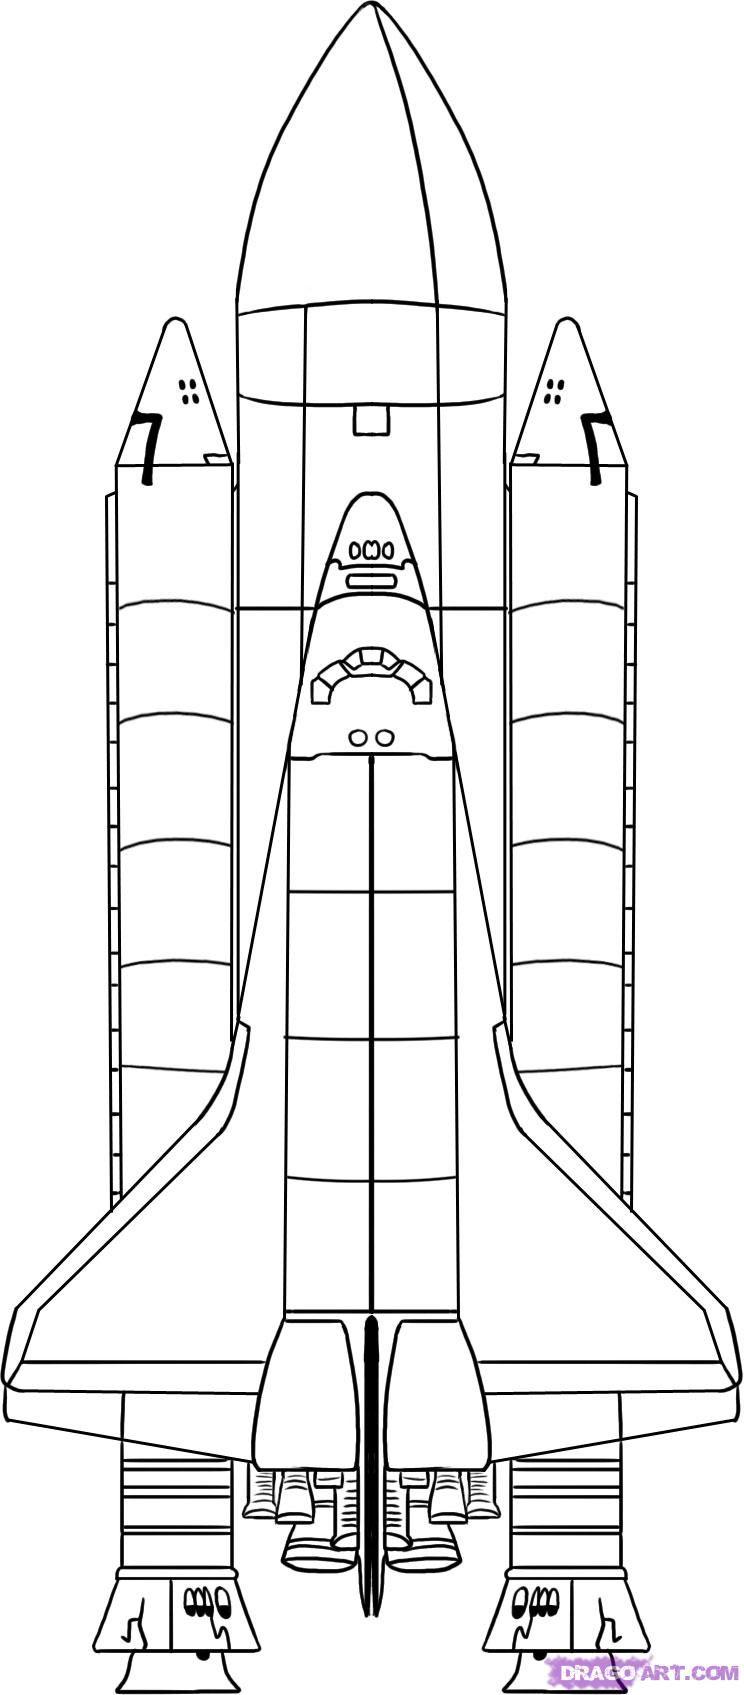 Spaceship Coloring Sheet #mkblueridge #MacKid #